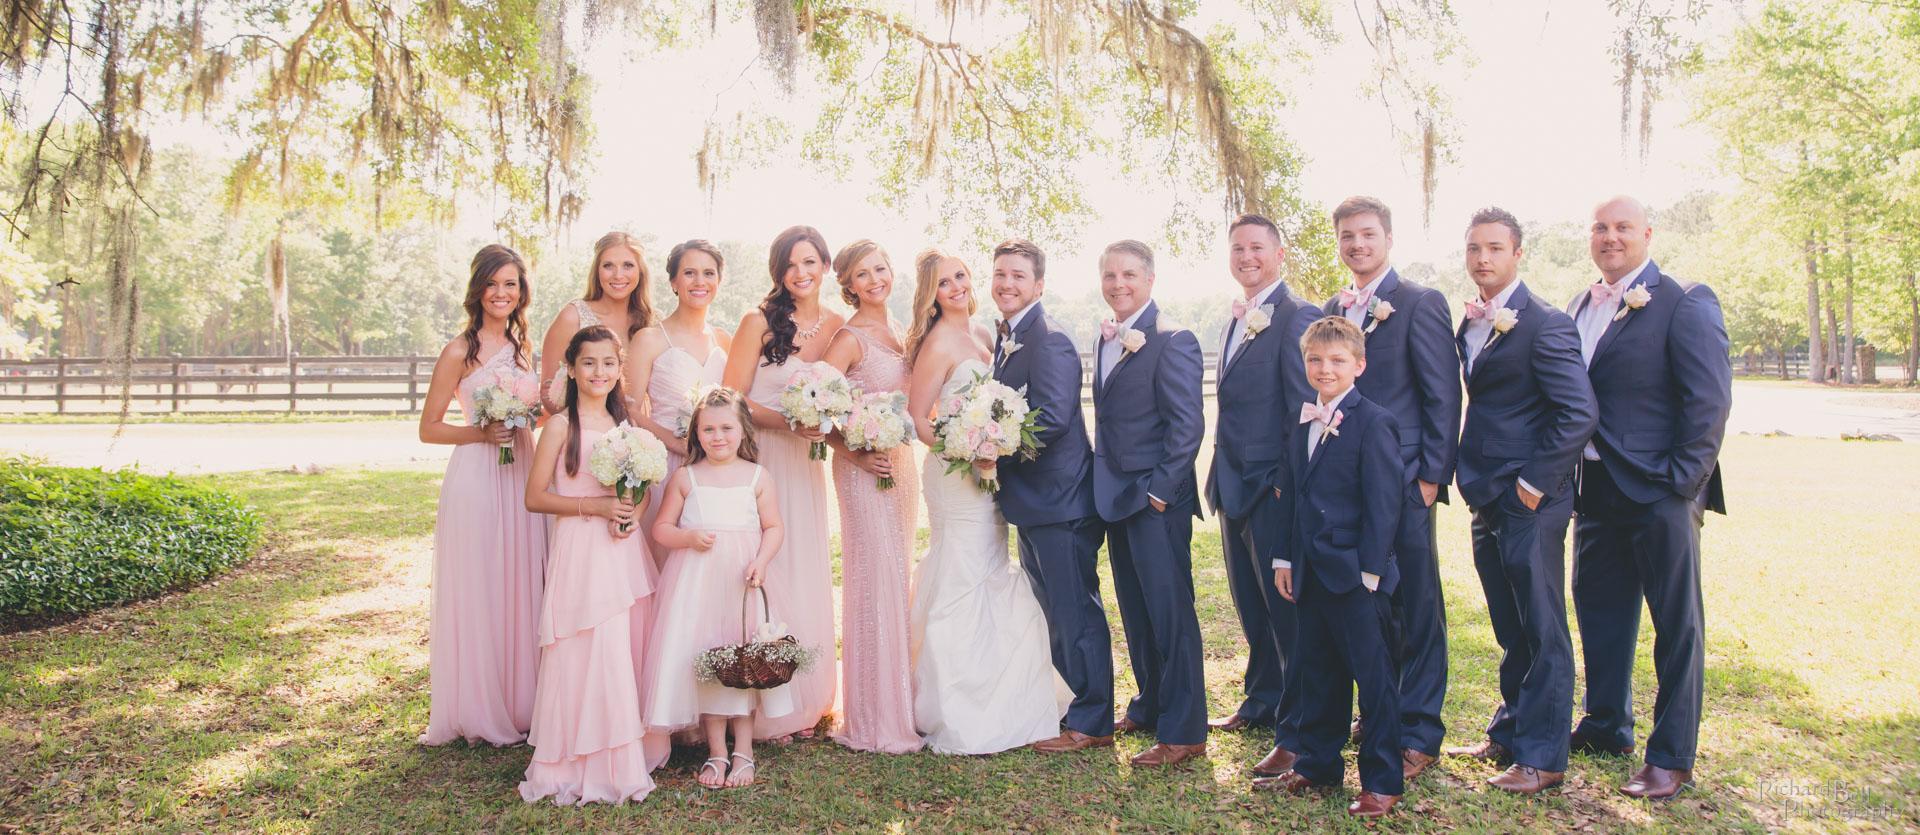 Tyson wedding party